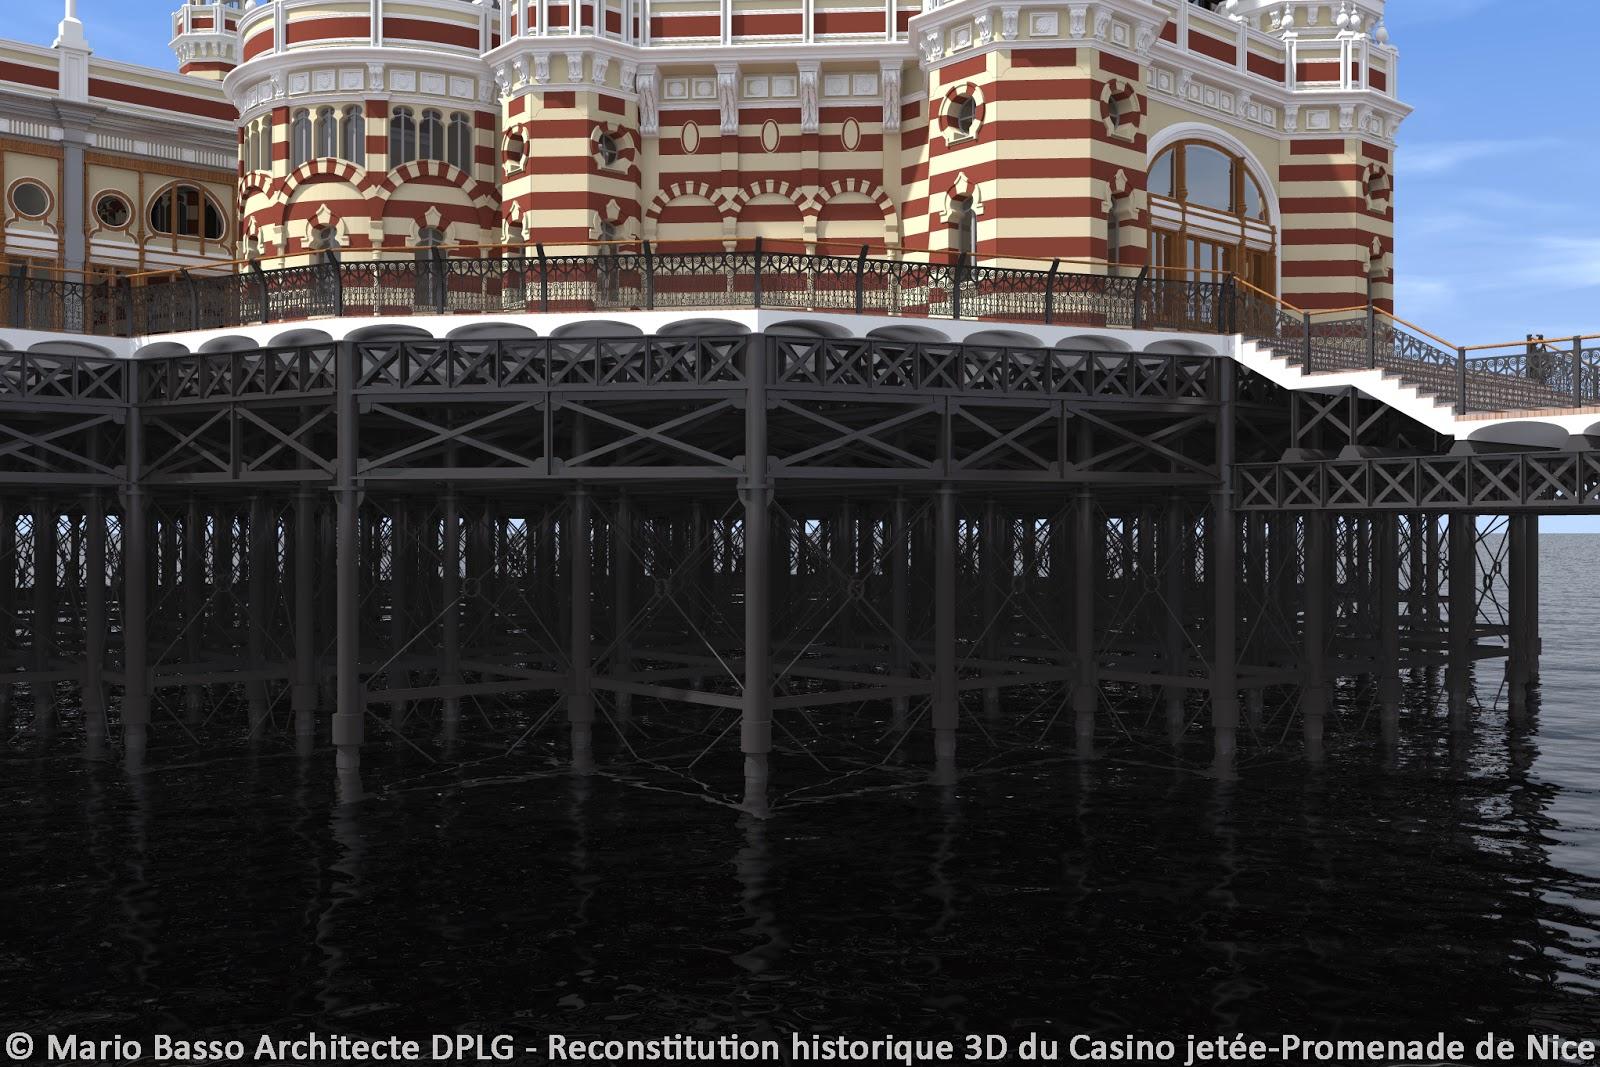 casino jetee promenade de nice en 3d plate forme et pilotis. Black Bedroom Furniture Sets. Home Design Ideas